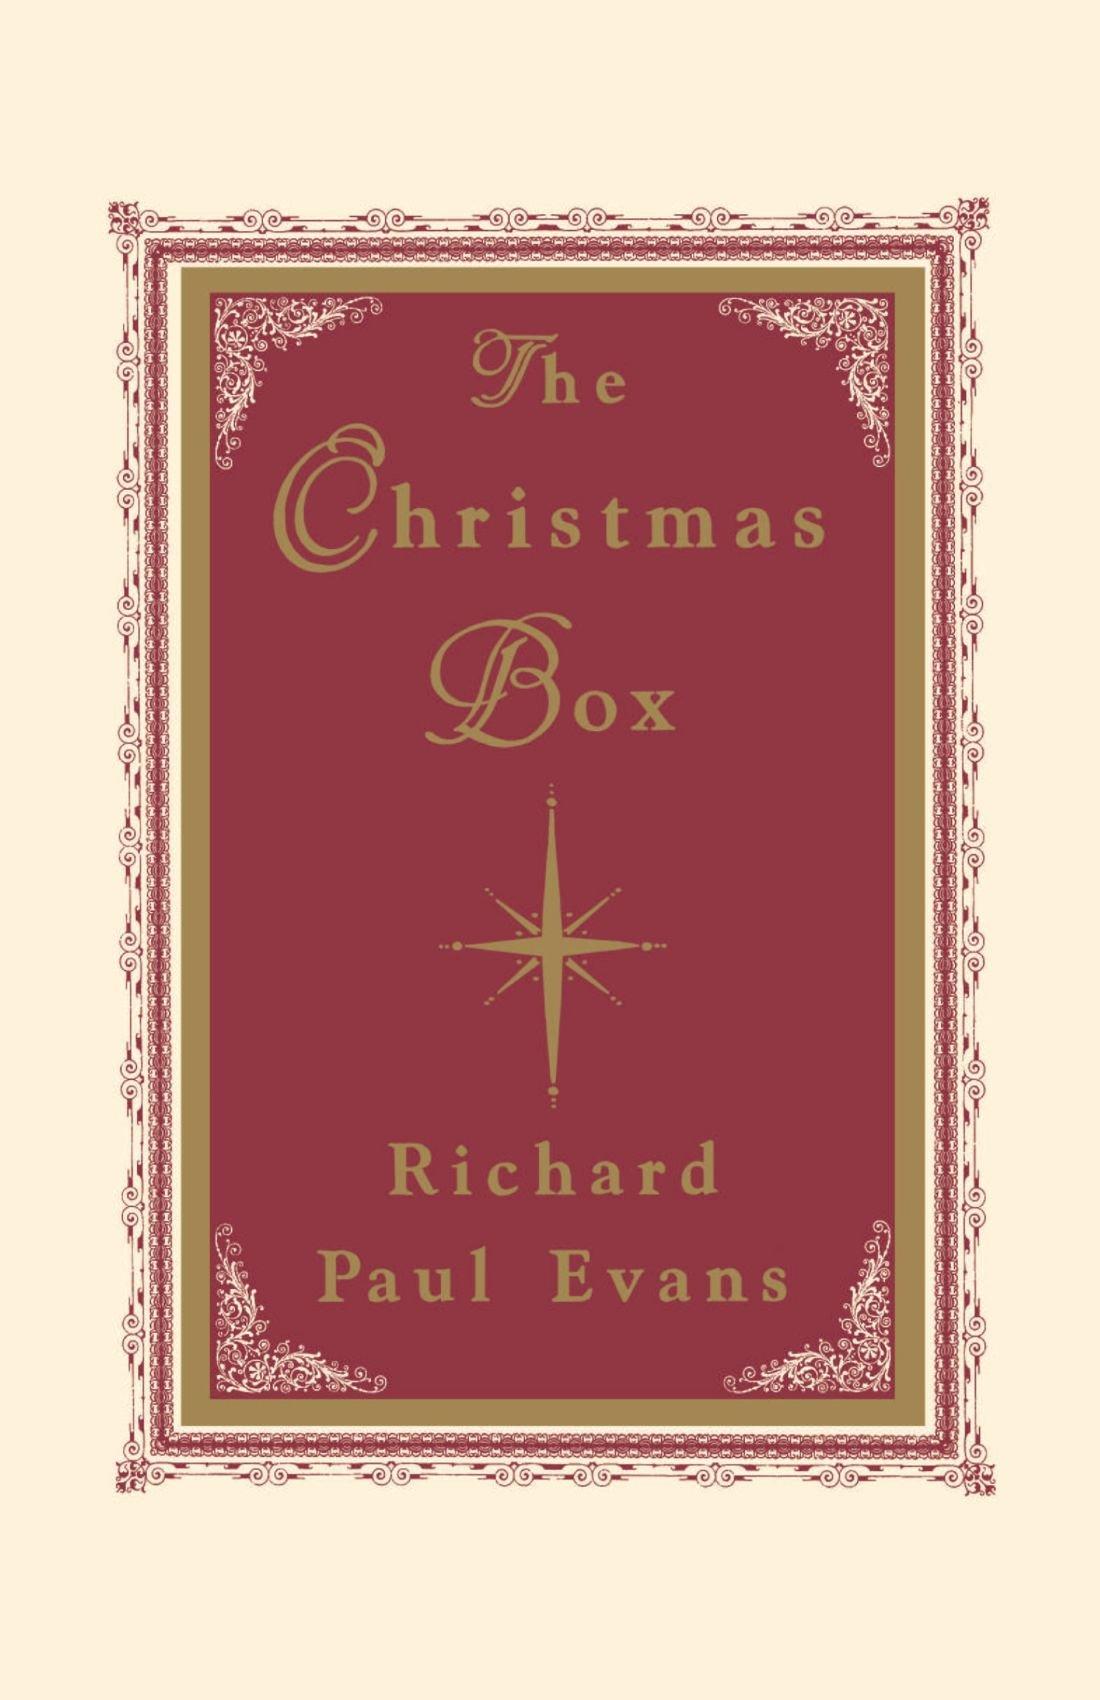 The Christmas Box LP: Richard Paul Evans: 9780743236560: Amazon ...